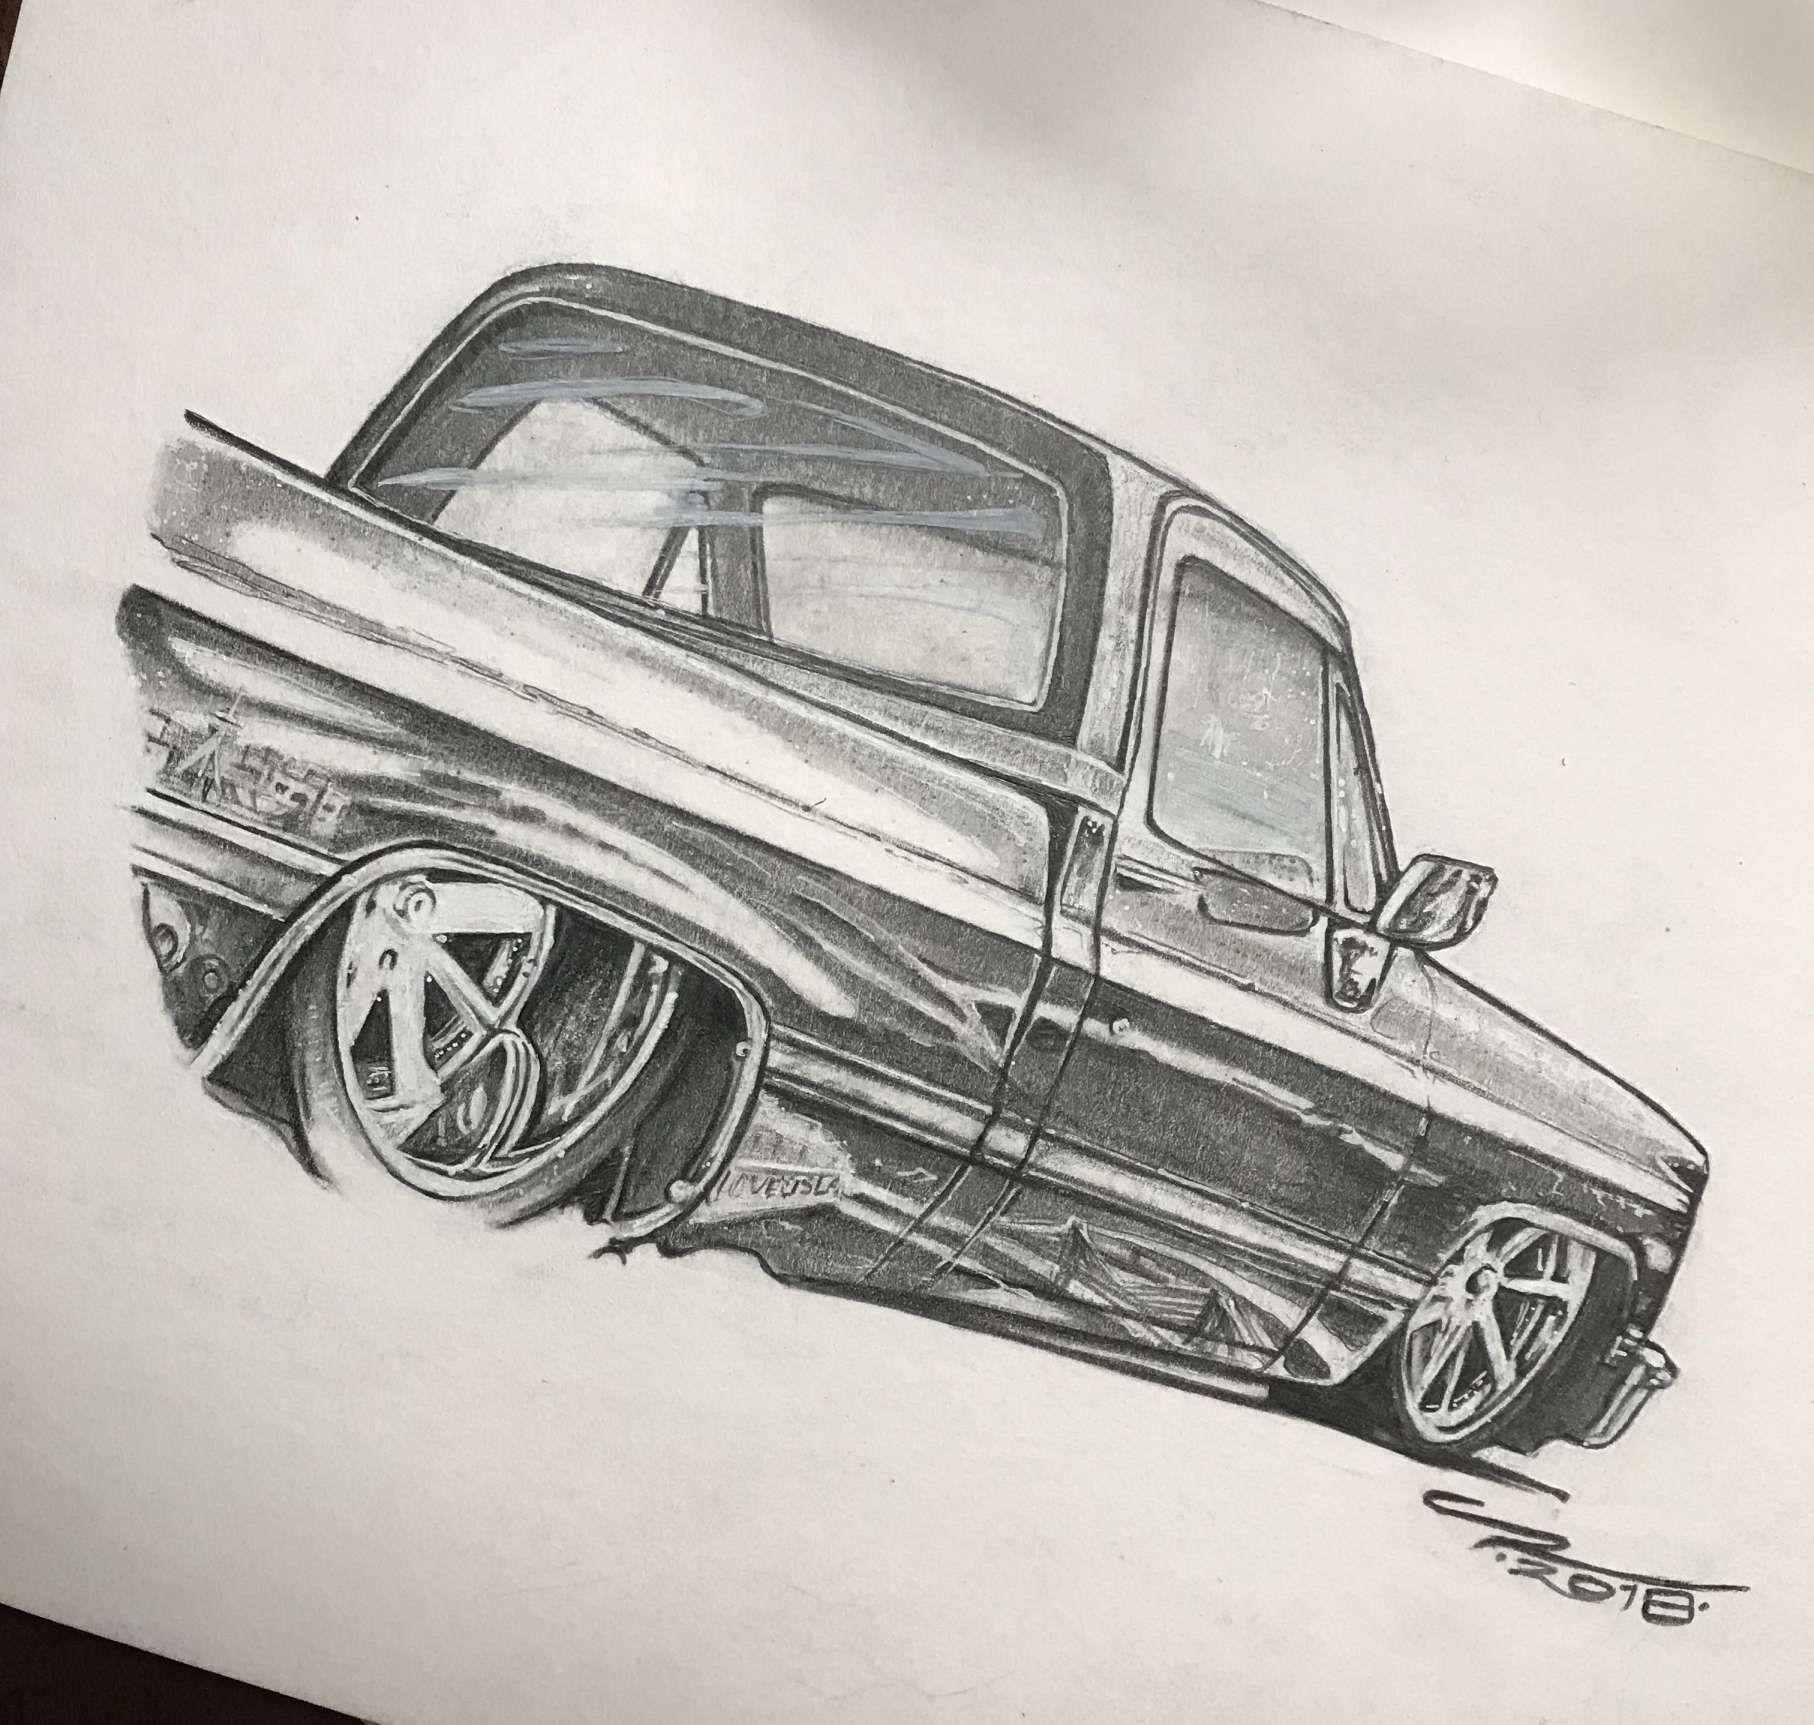 17 Custom Truck Drawings Tatuajes De Coche Camioneta Dibujo Camiones Chevy